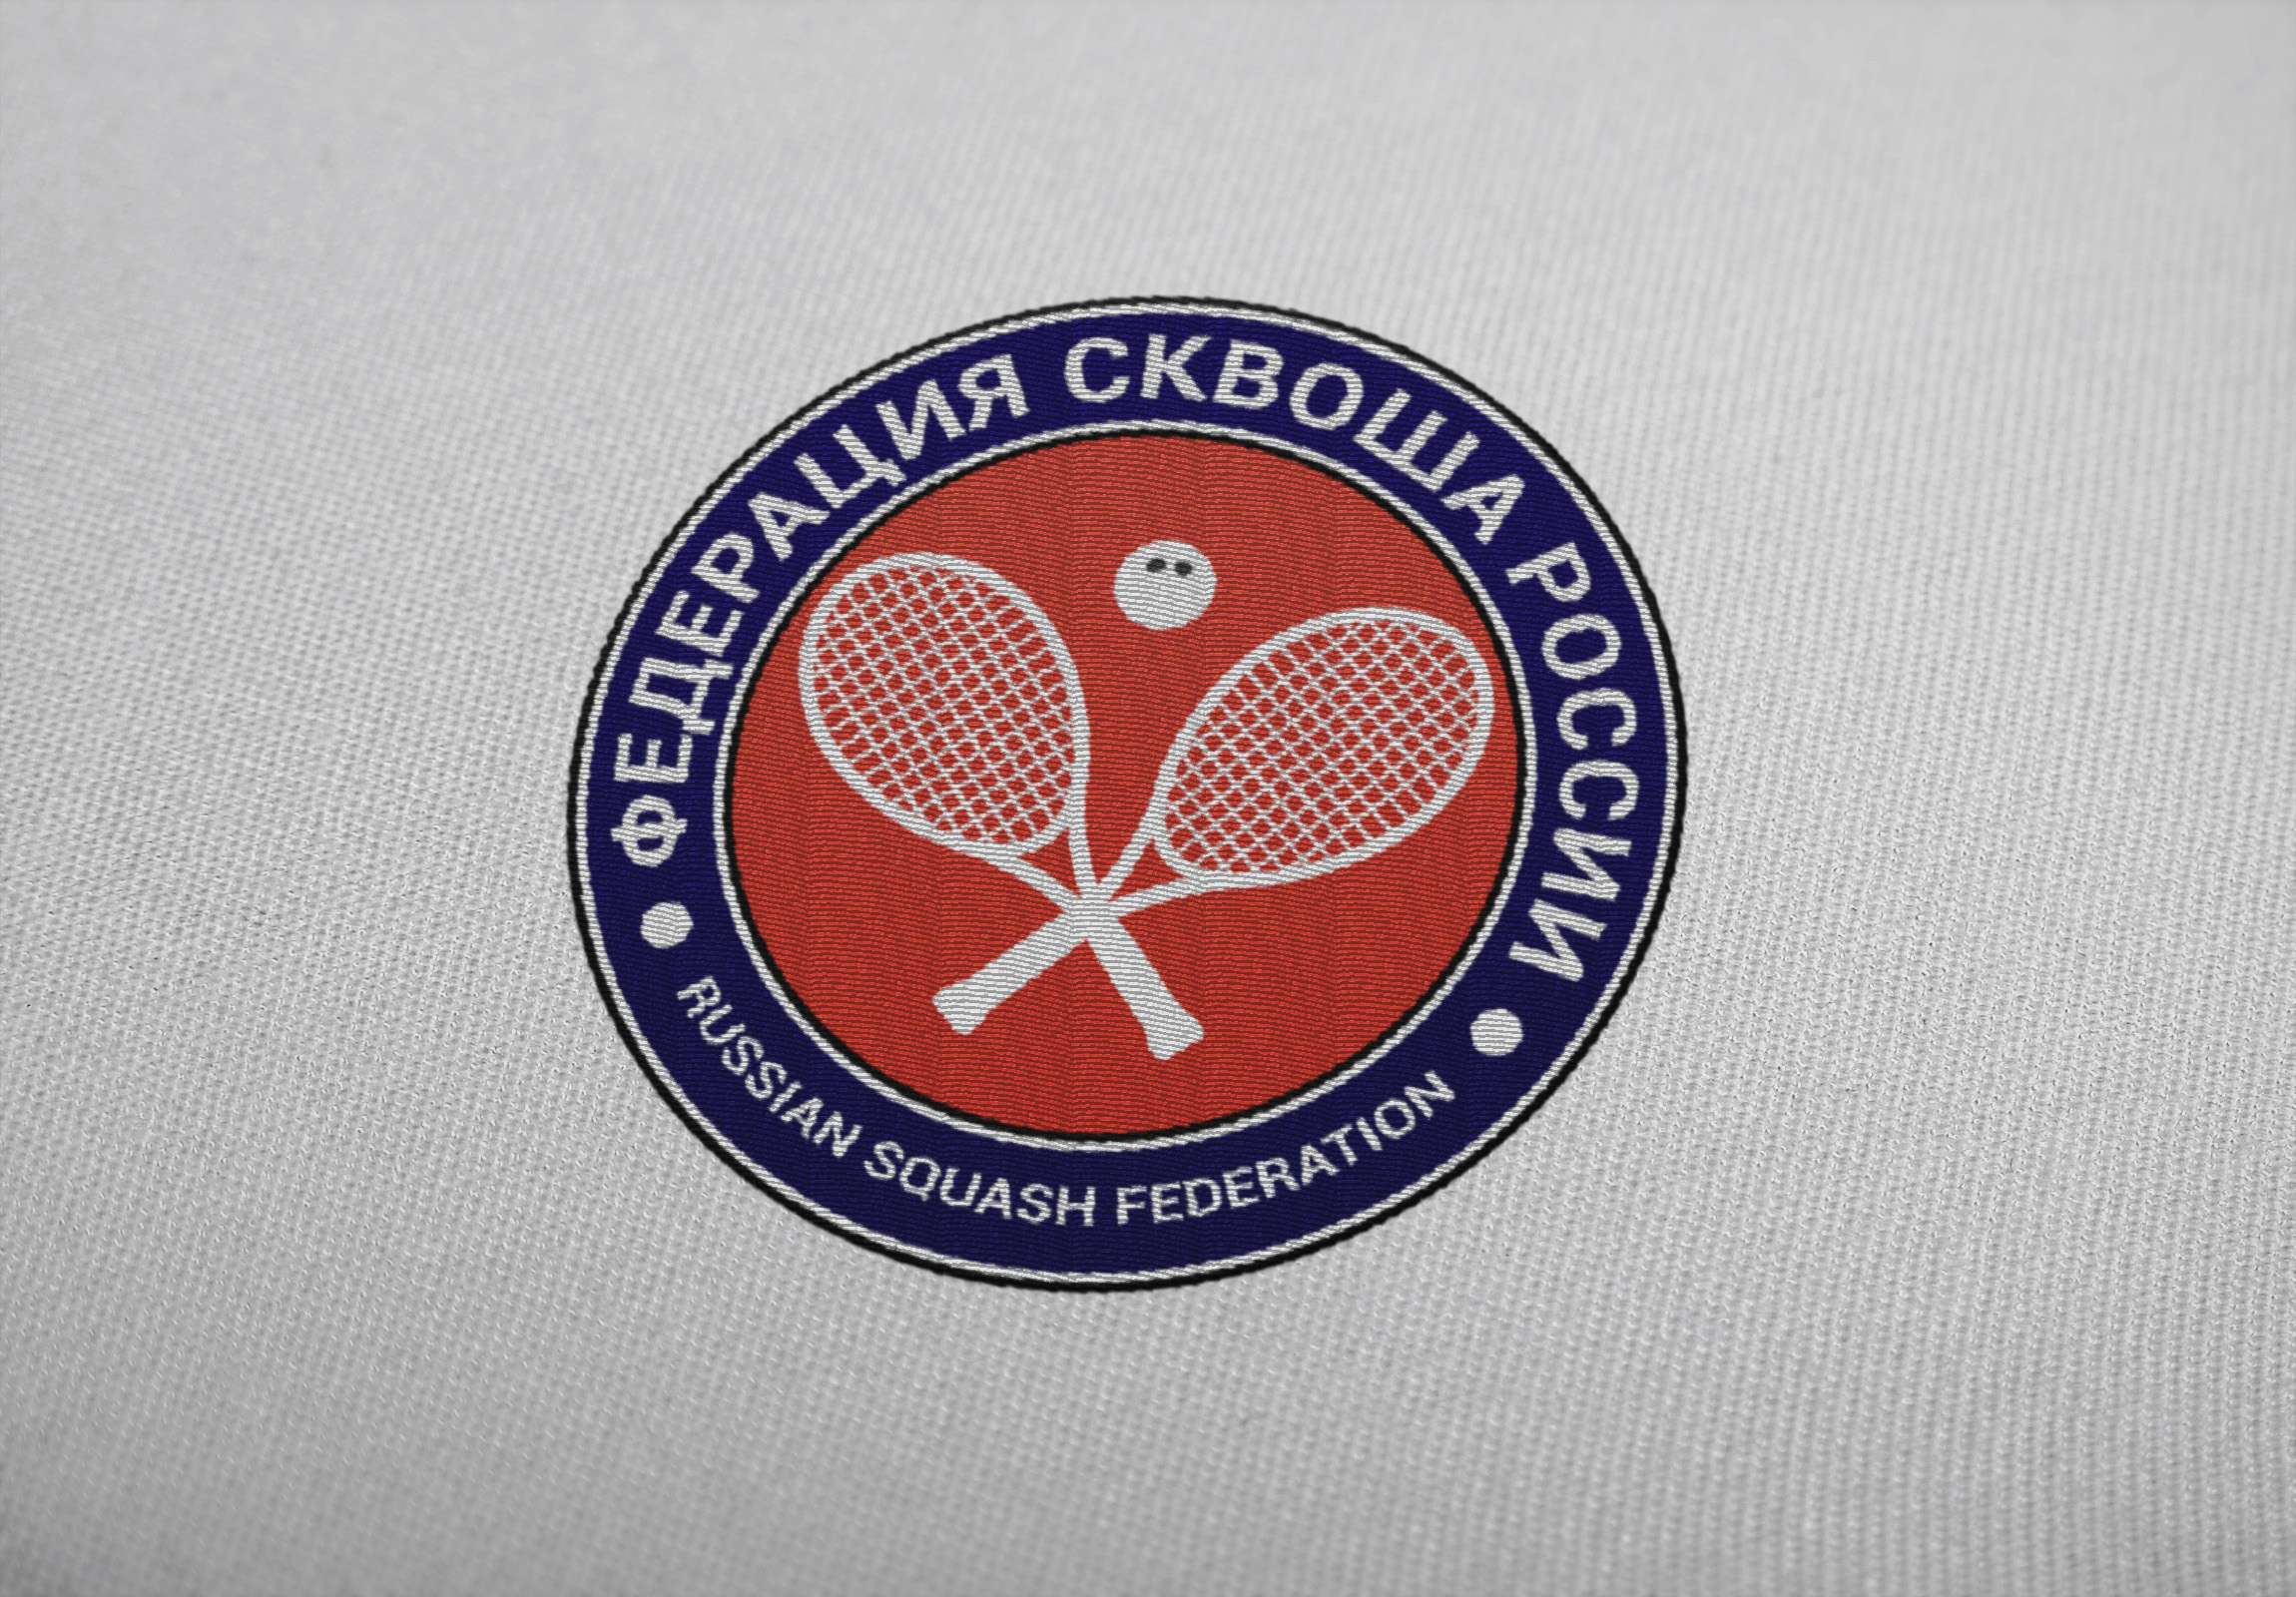 Разработать логотип для Федерации сквоша России фото f_1685f30842b37f3f.jpg